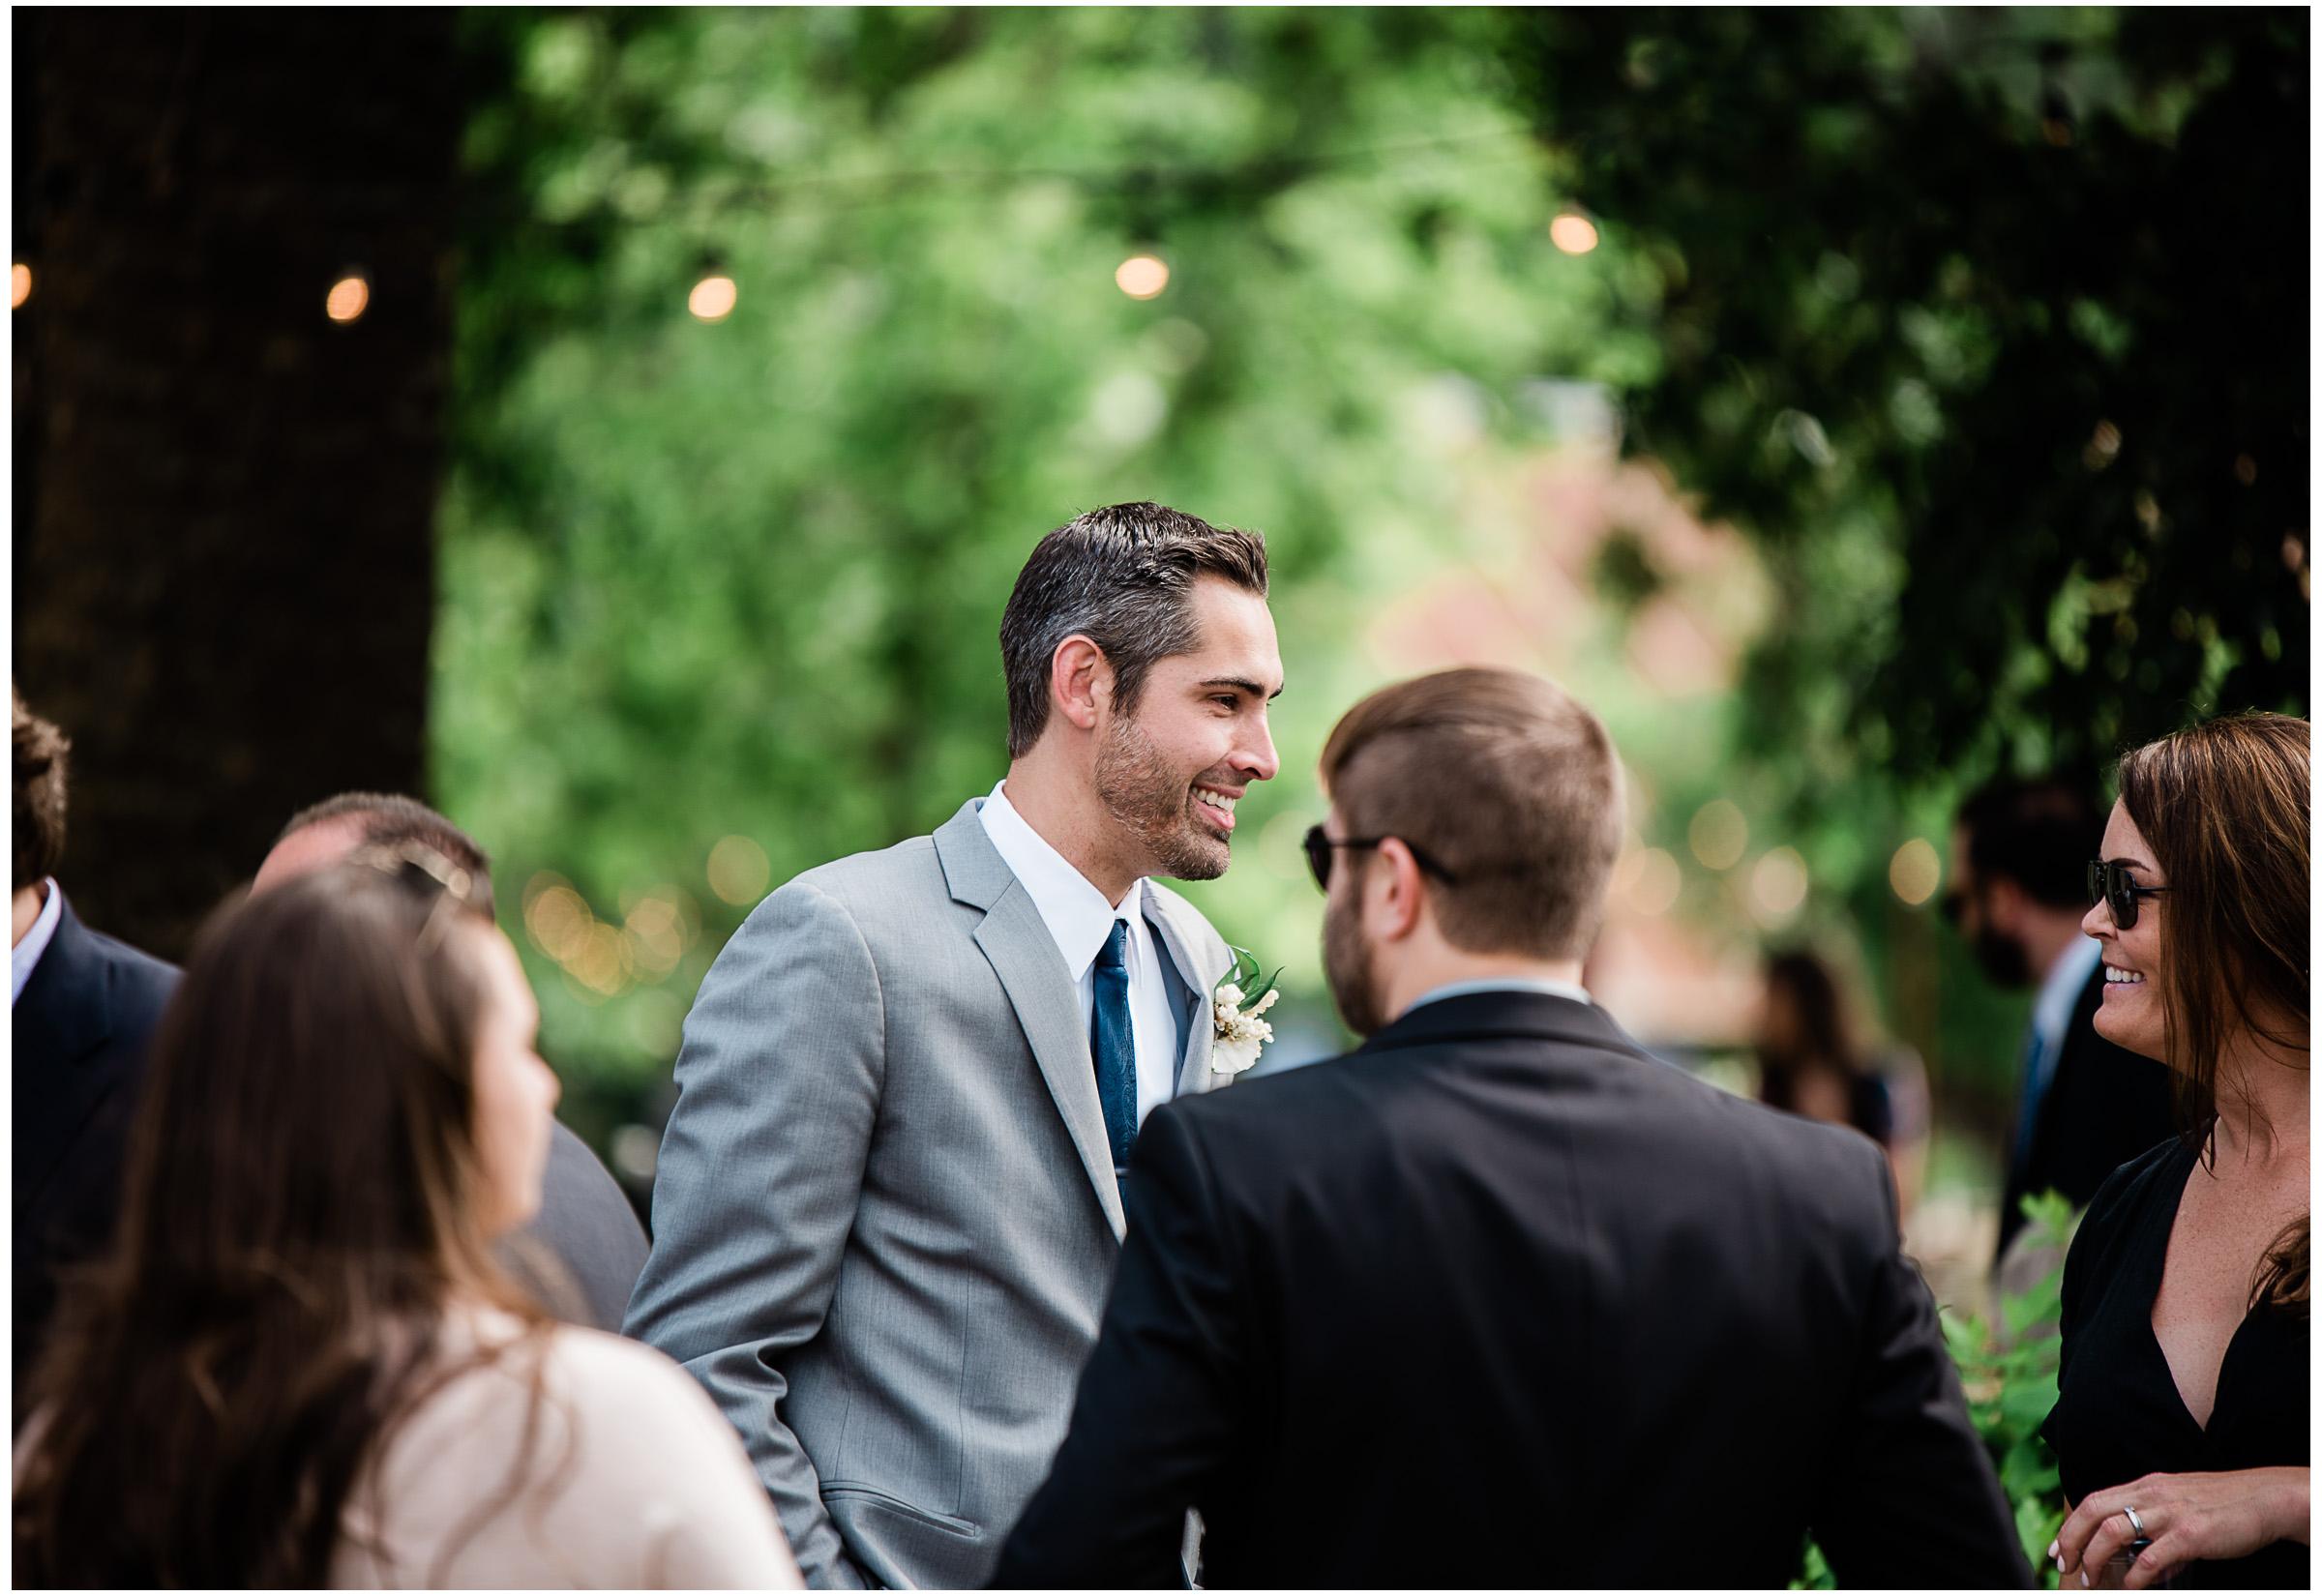 Winters Wedding - Sacramento Photographer - Field & Pond - Justin Wilcox Photography - 23.jpg